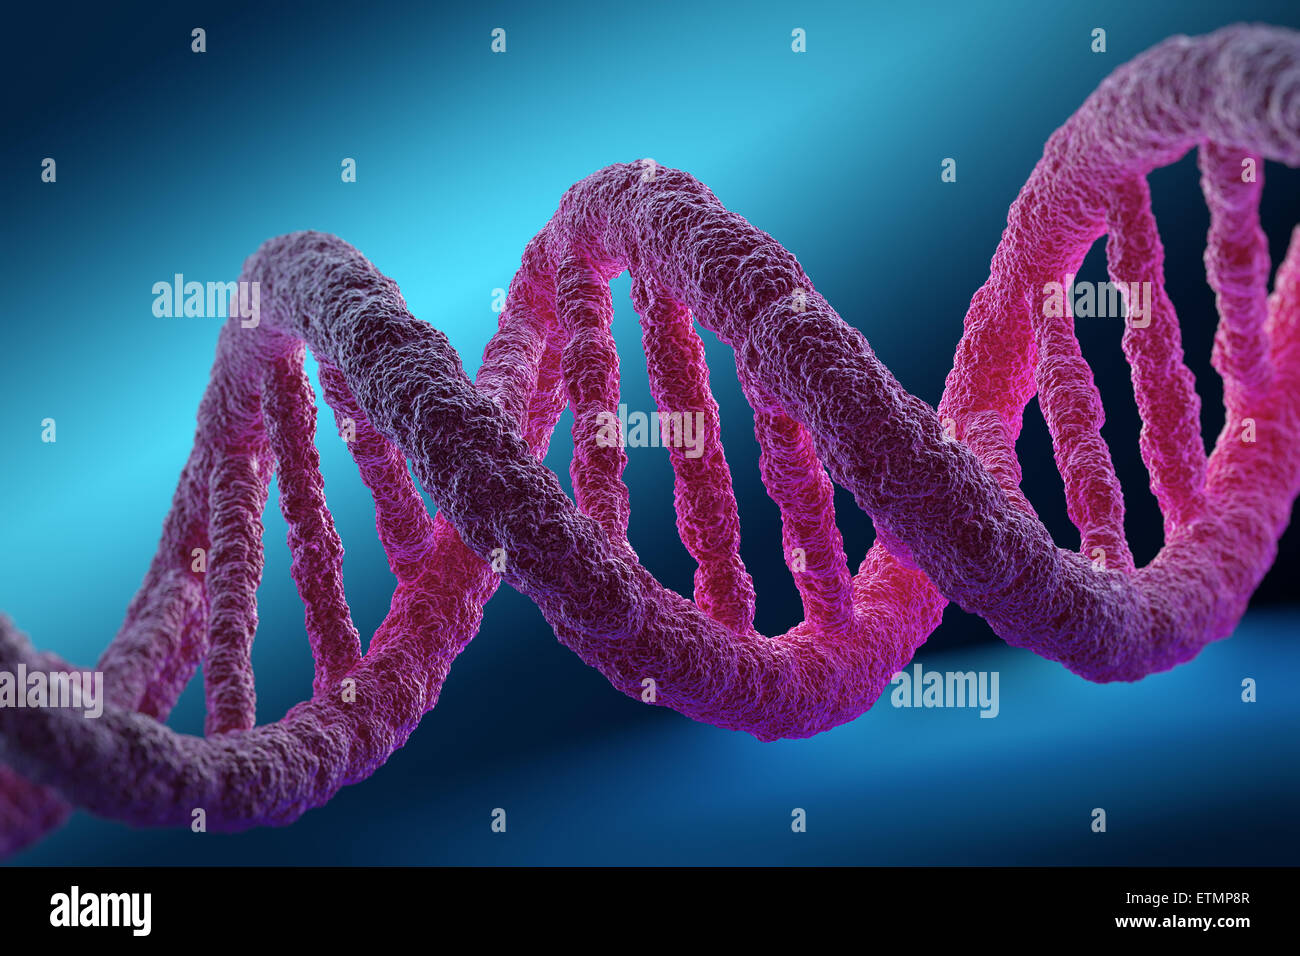 Stylized illustration of strands of human DNA, deoxyribonucleic acid. - Stock Image